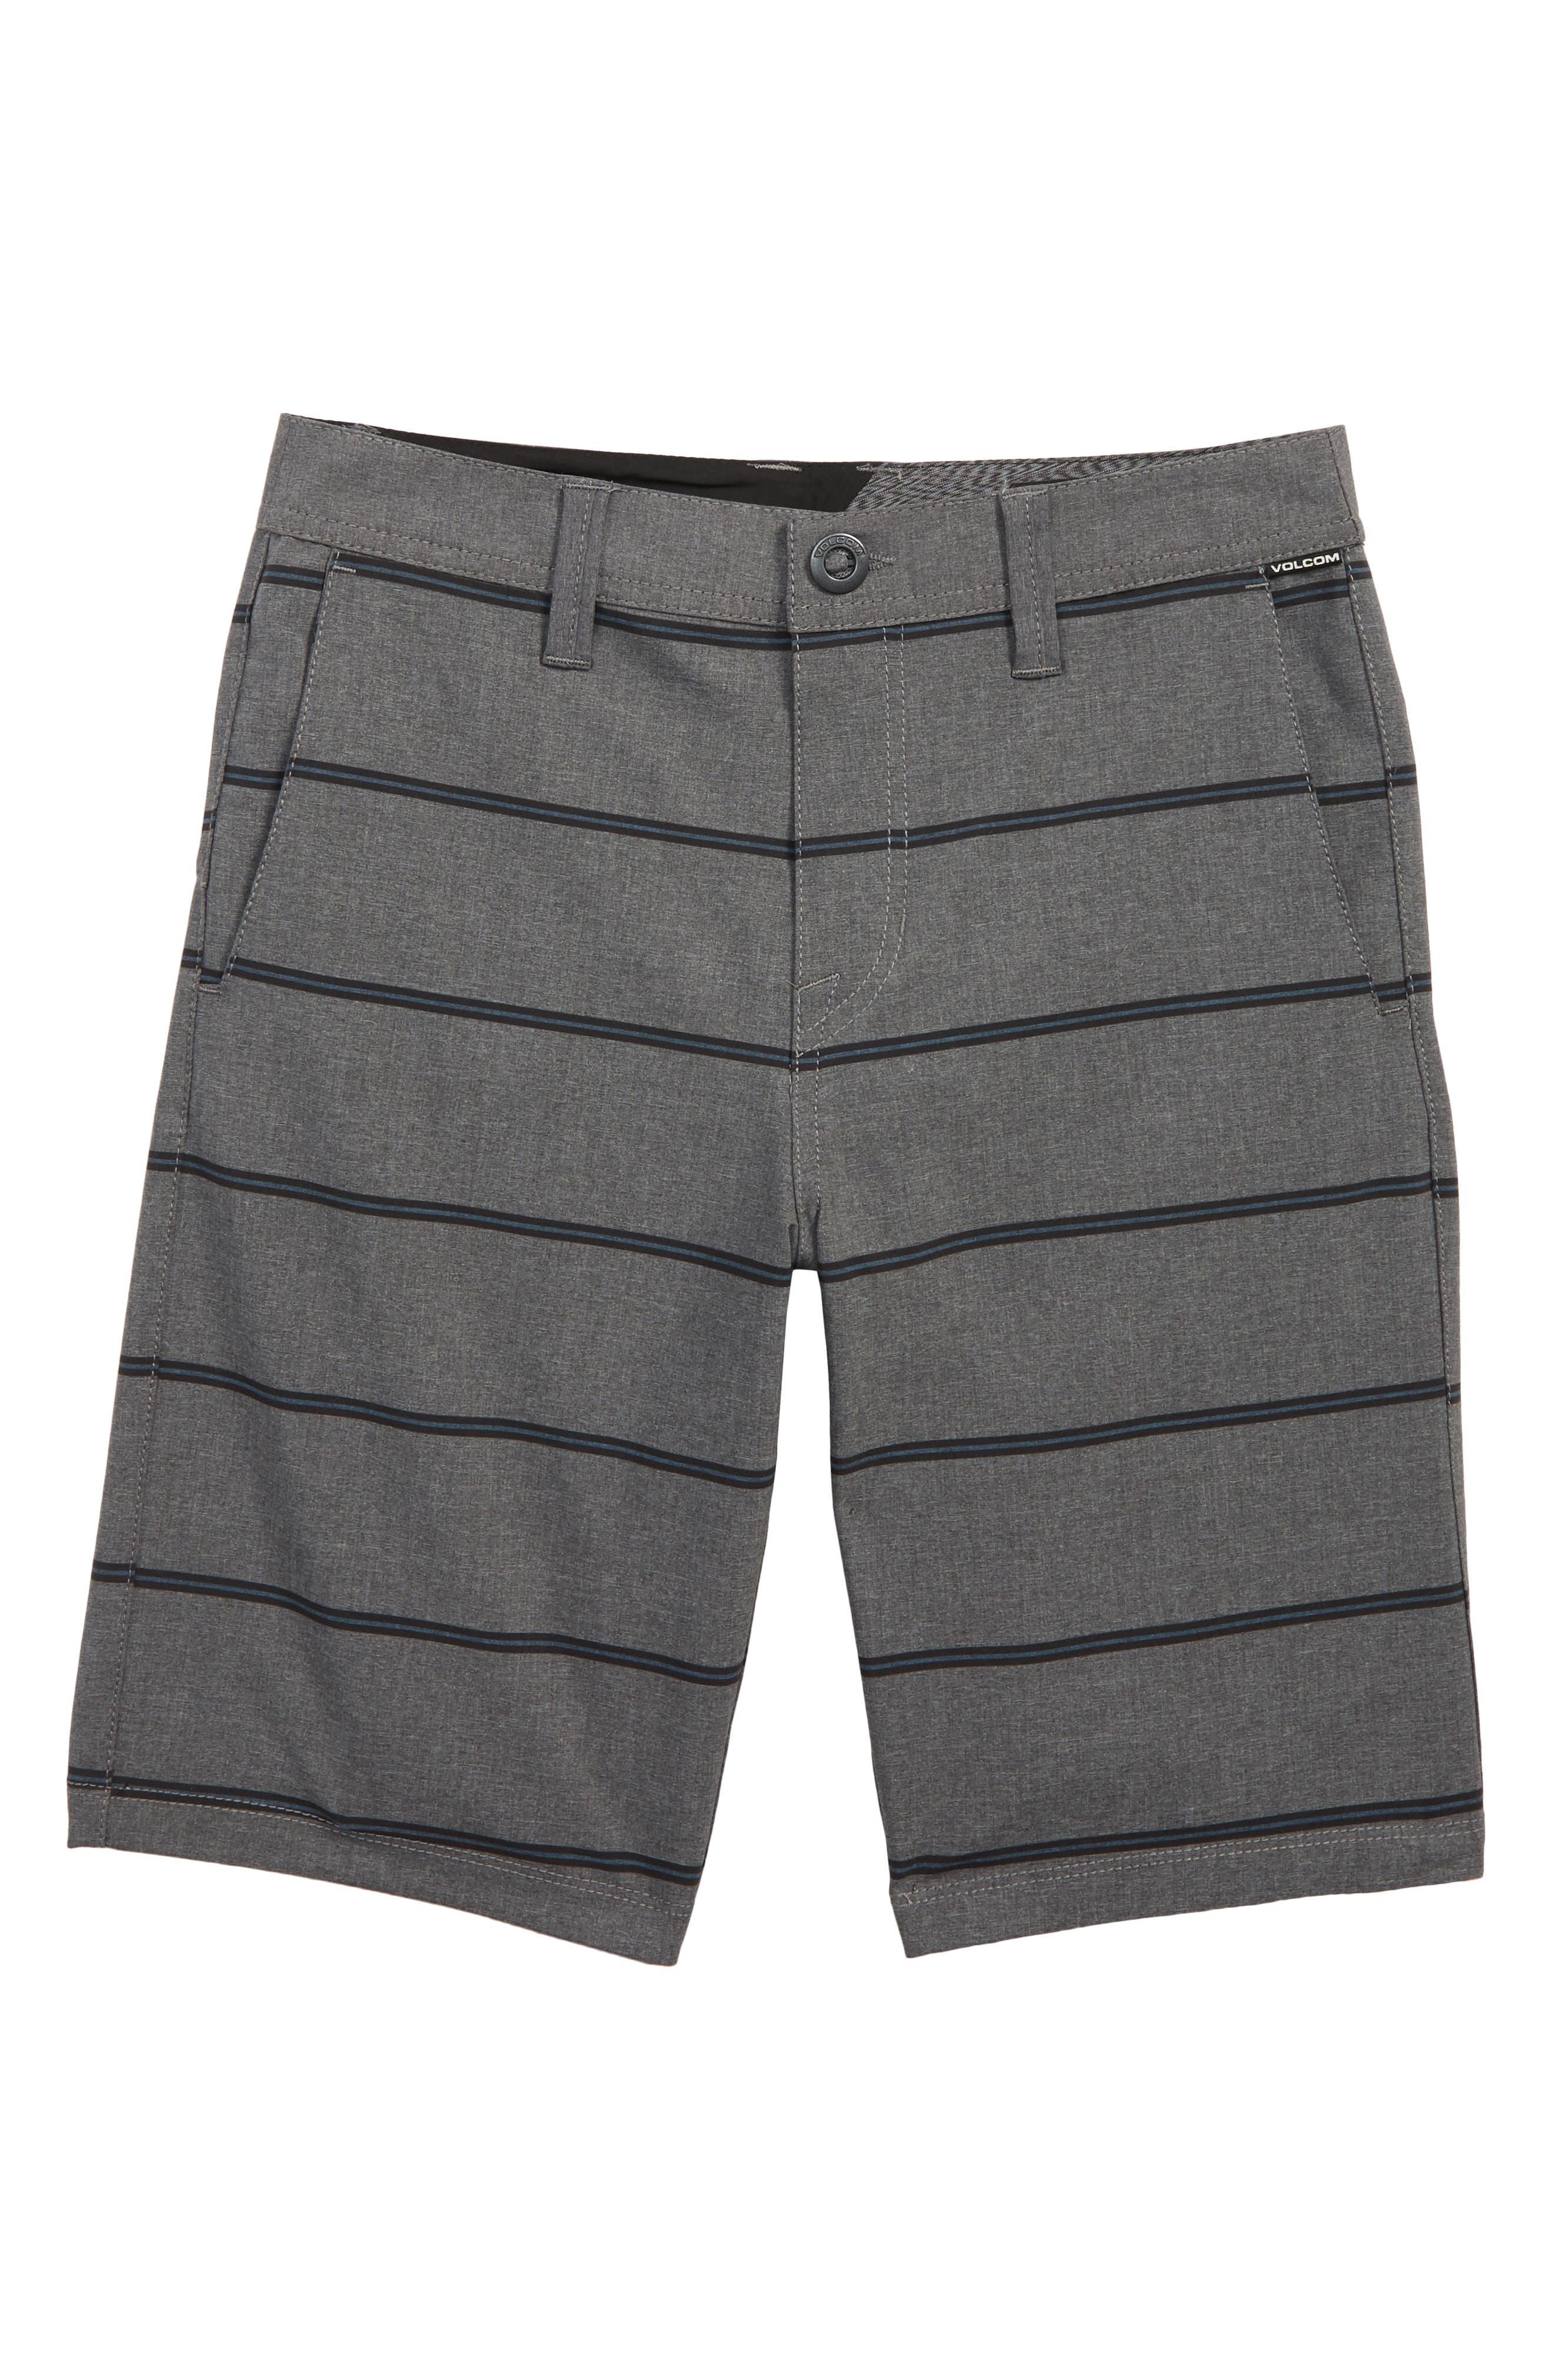 Frickin Surf N' Turf Mix Hybrid Shorts,                         Main,                         color, GREY METAL